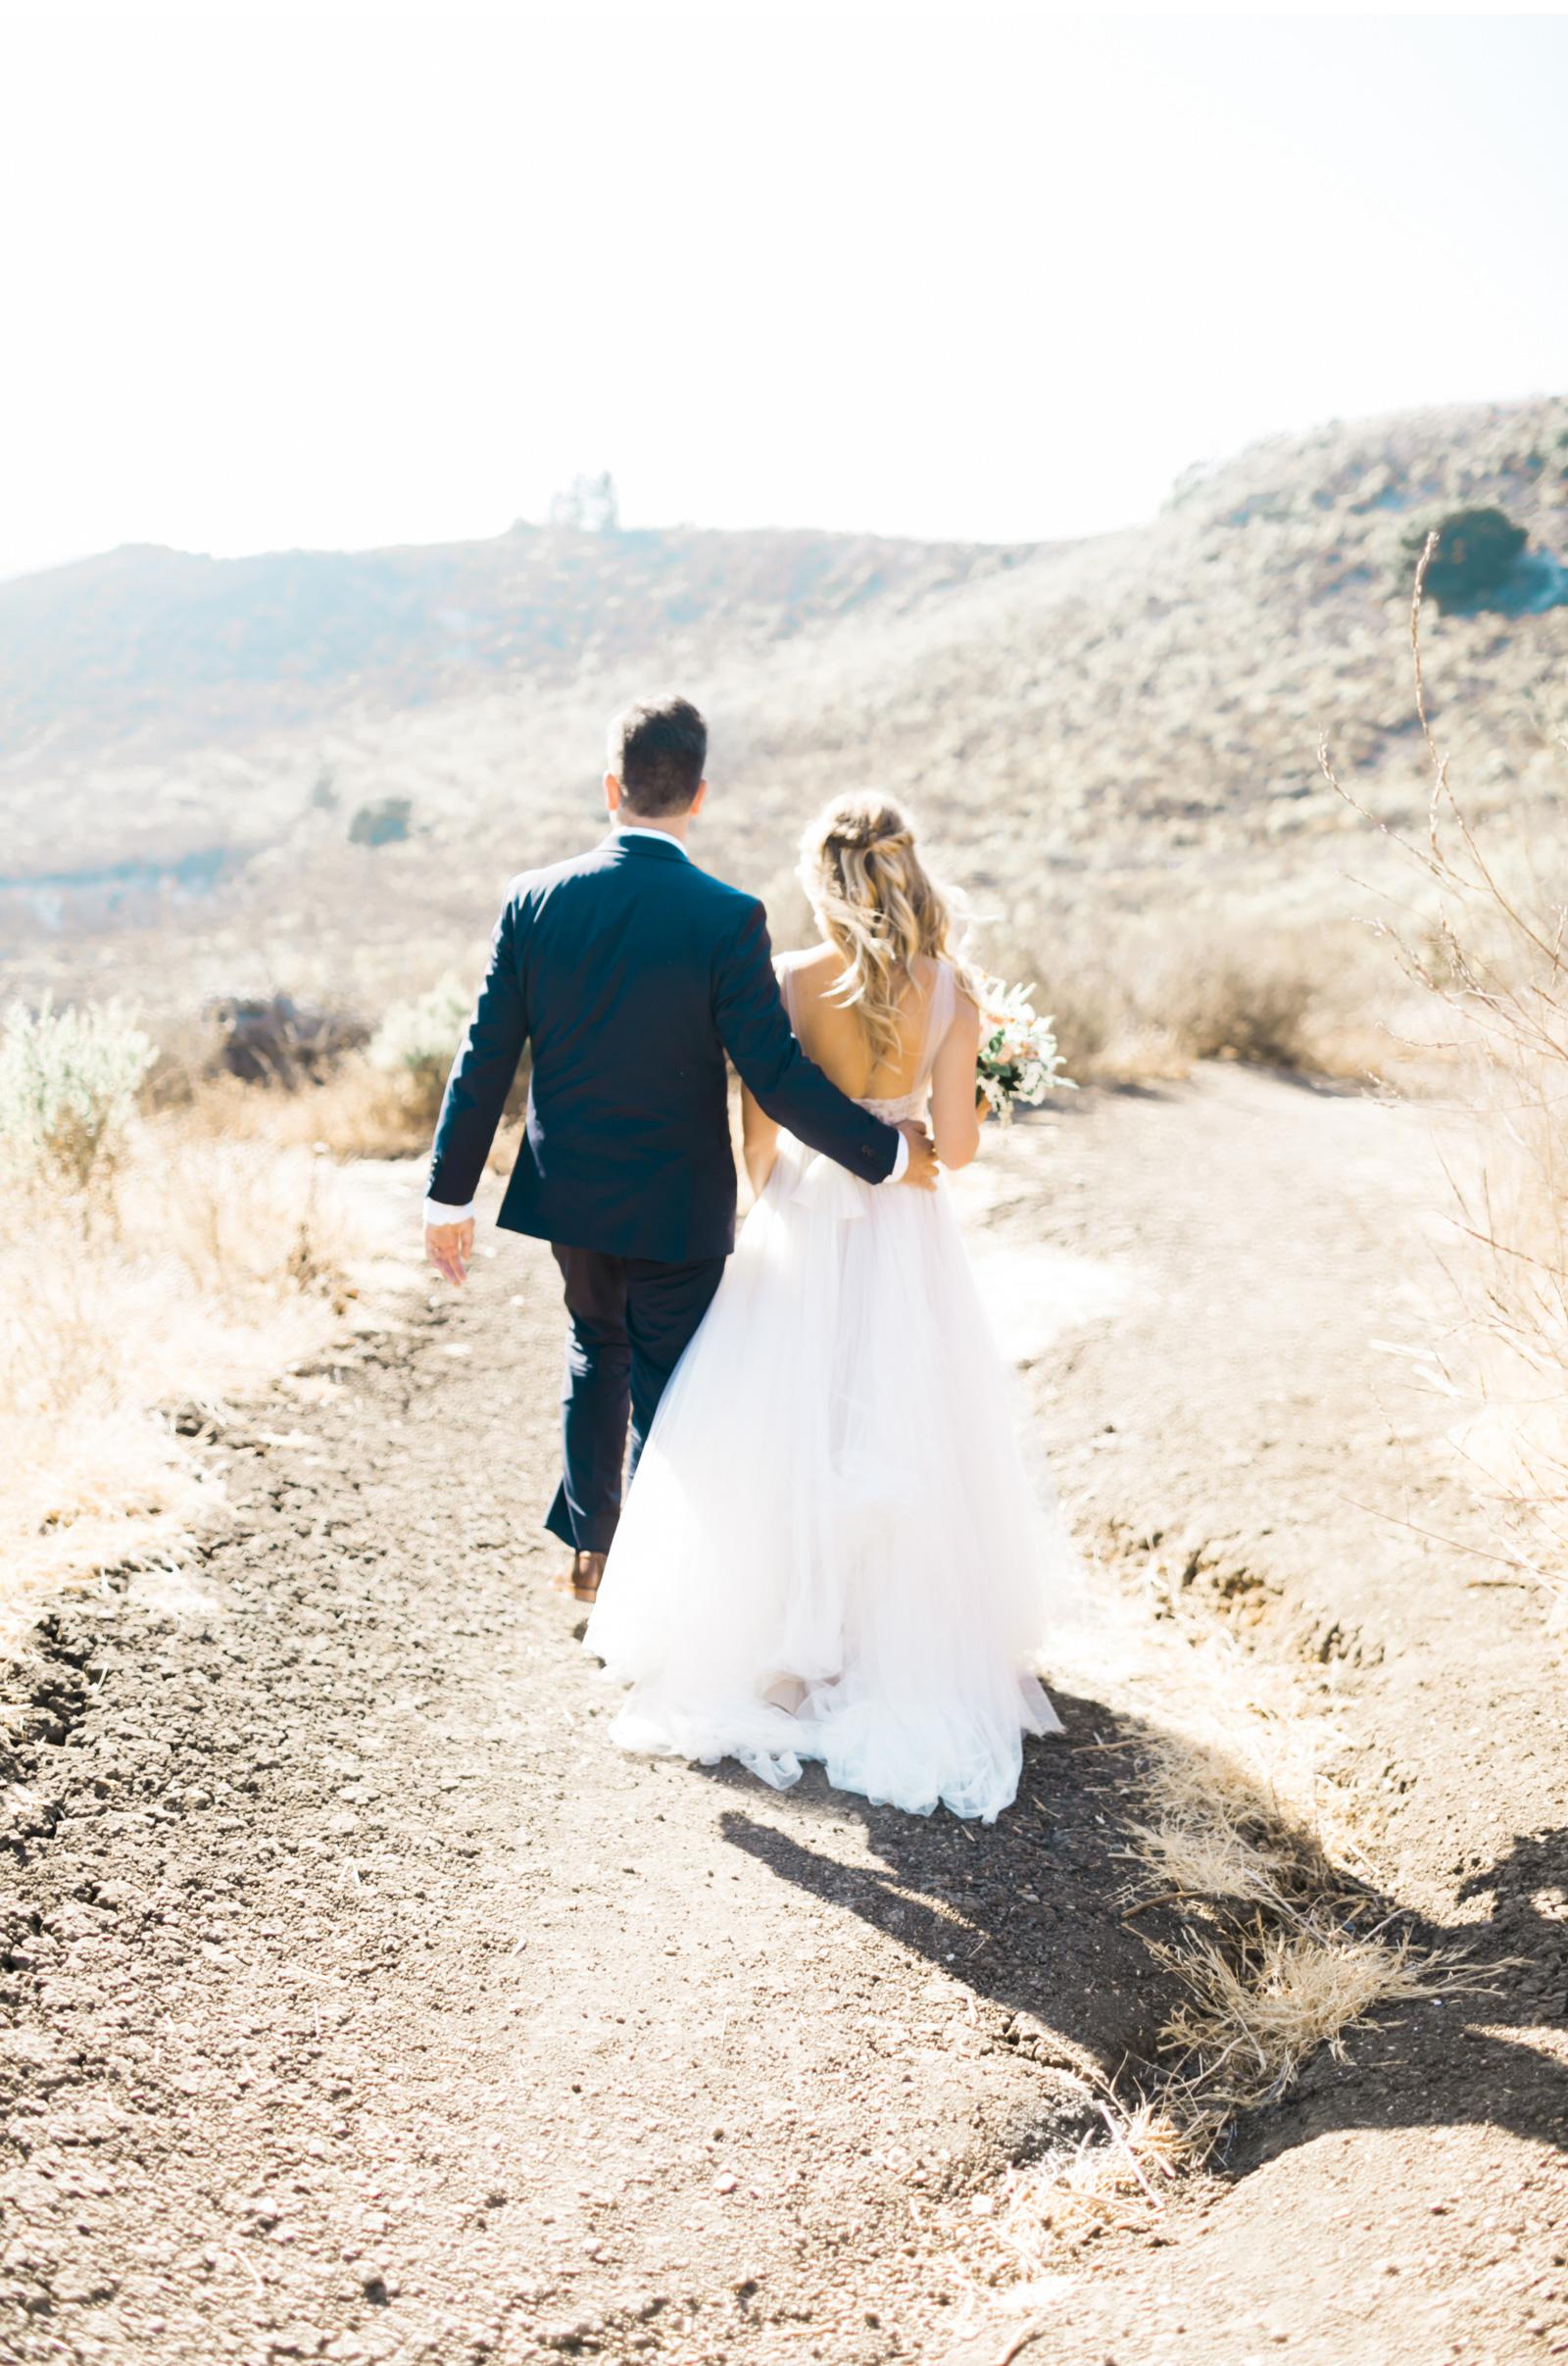 Style-Me-Pretty-San-Luis-Obispo-Wedding-Natalie-Schutt-Photography_11.jpg